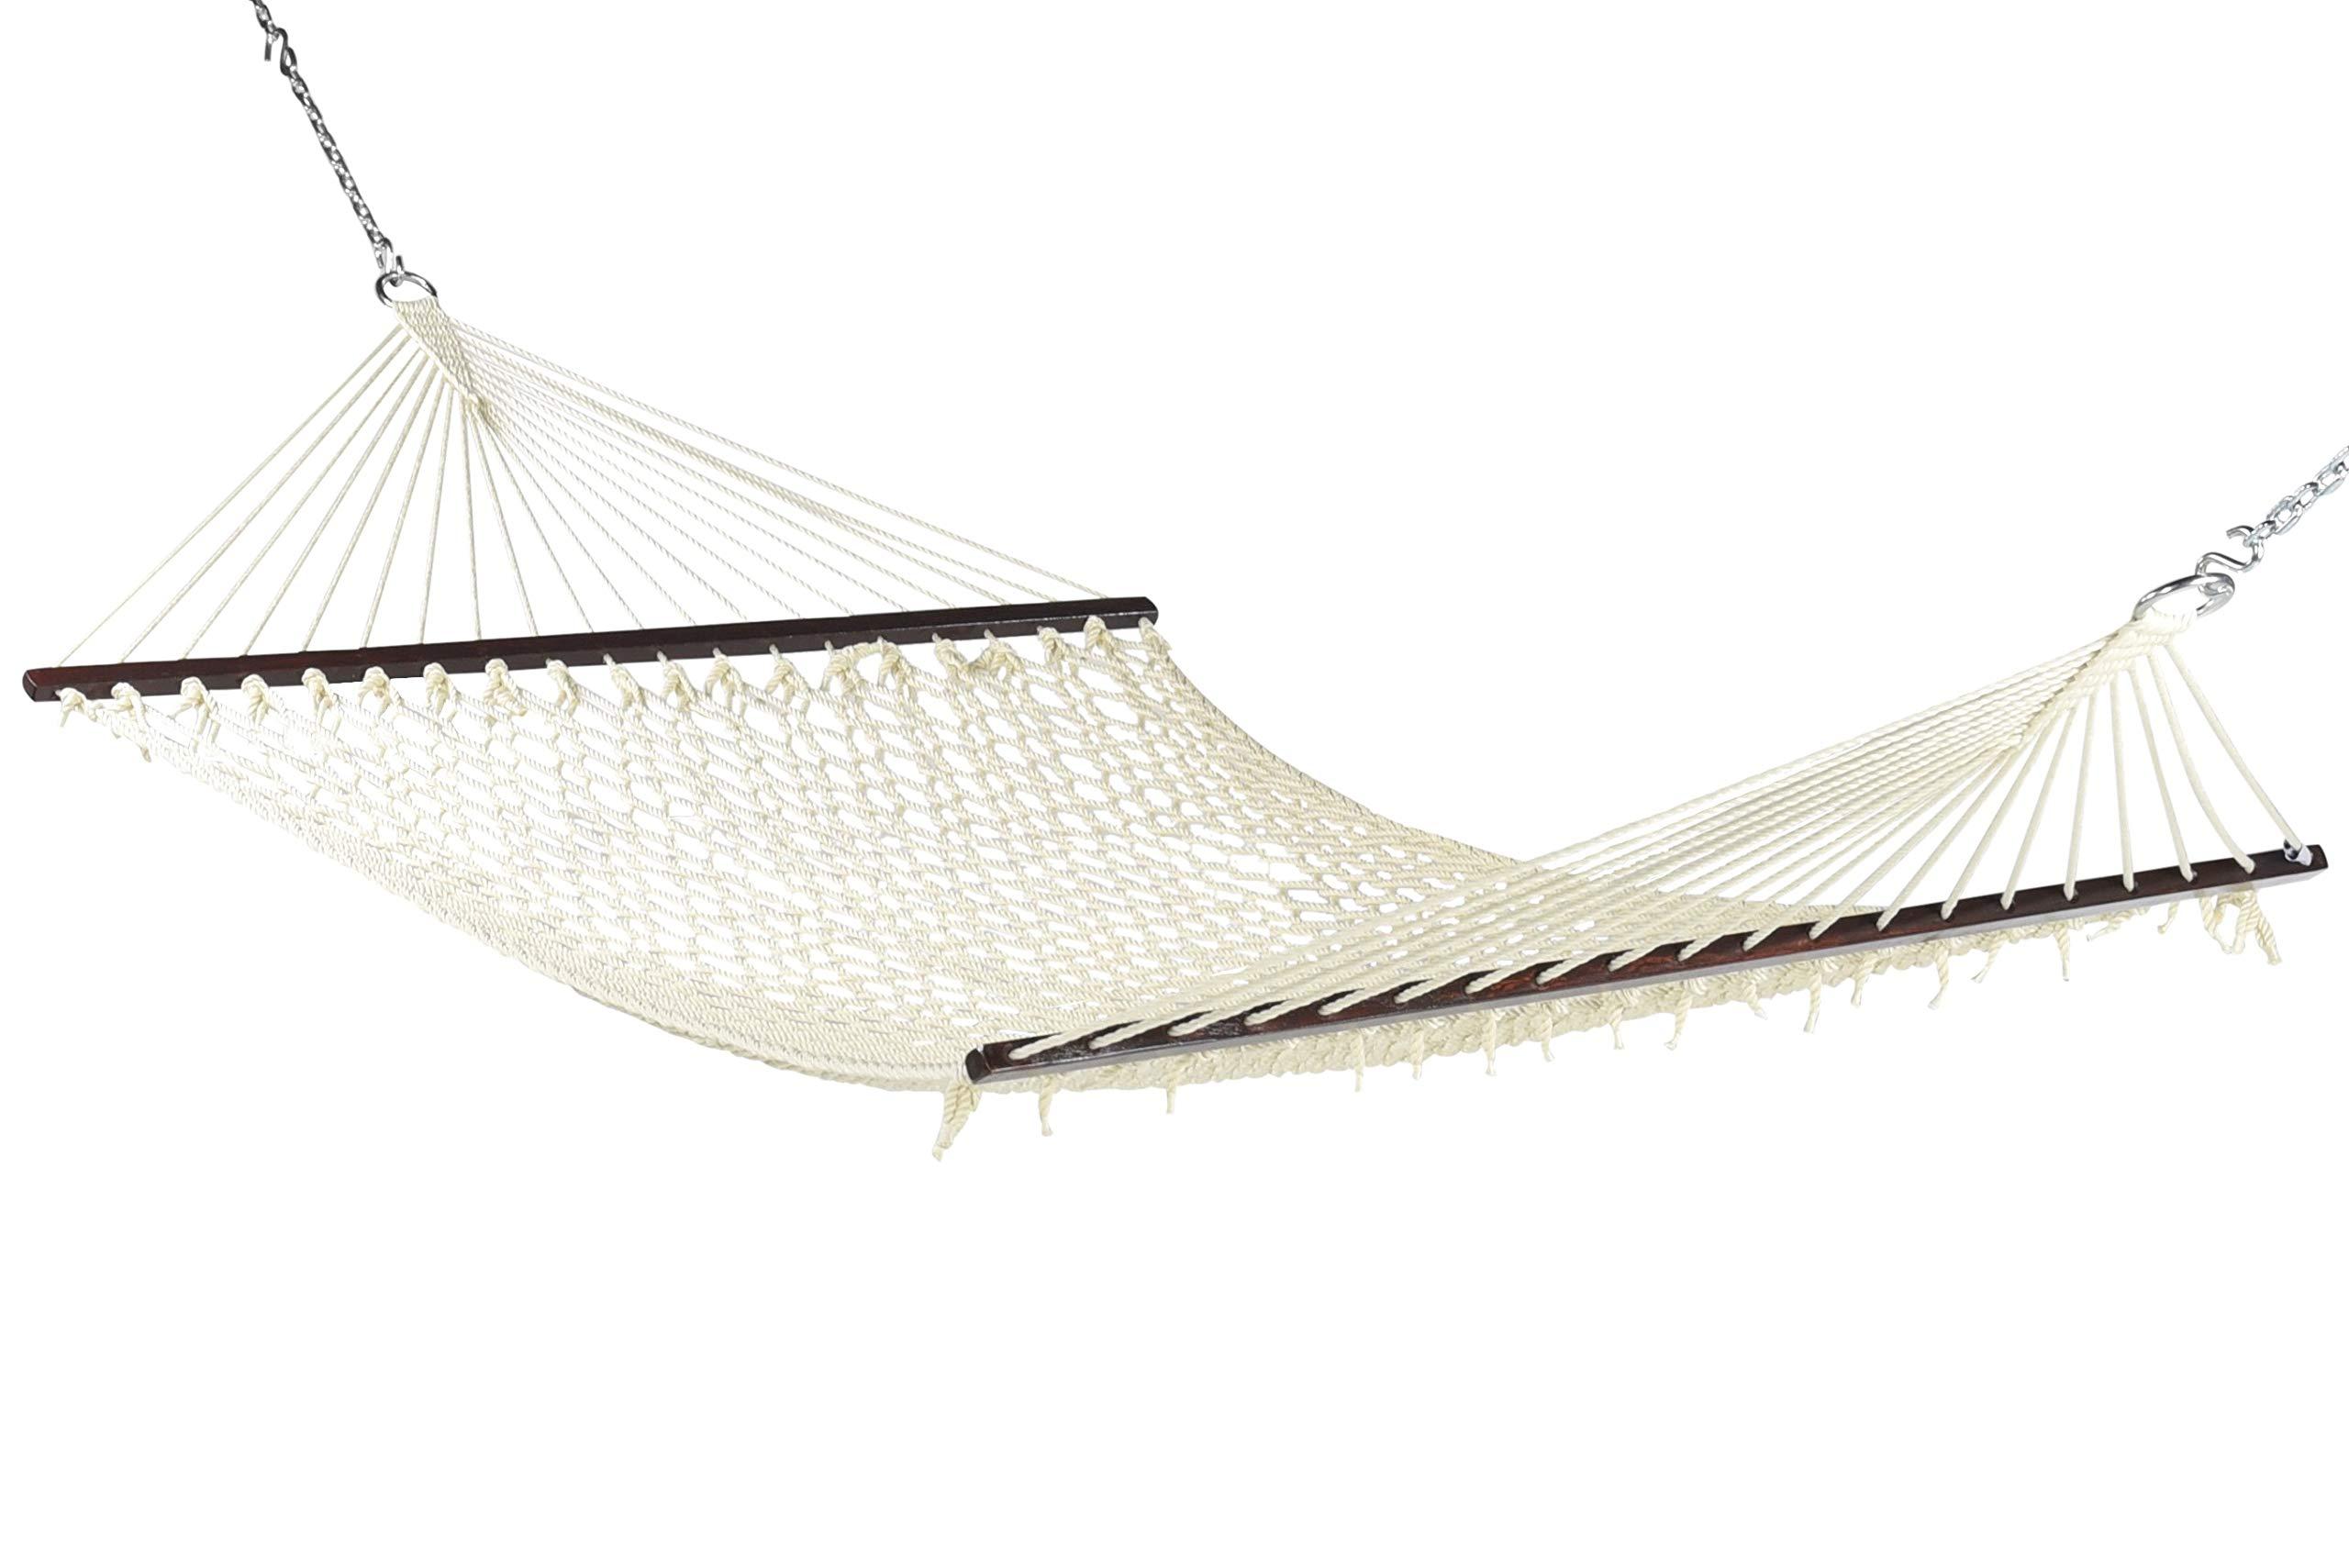 Caribbean Rope Hammock - 55 Inch - Soft-Spun Polyester (Natural Cream)